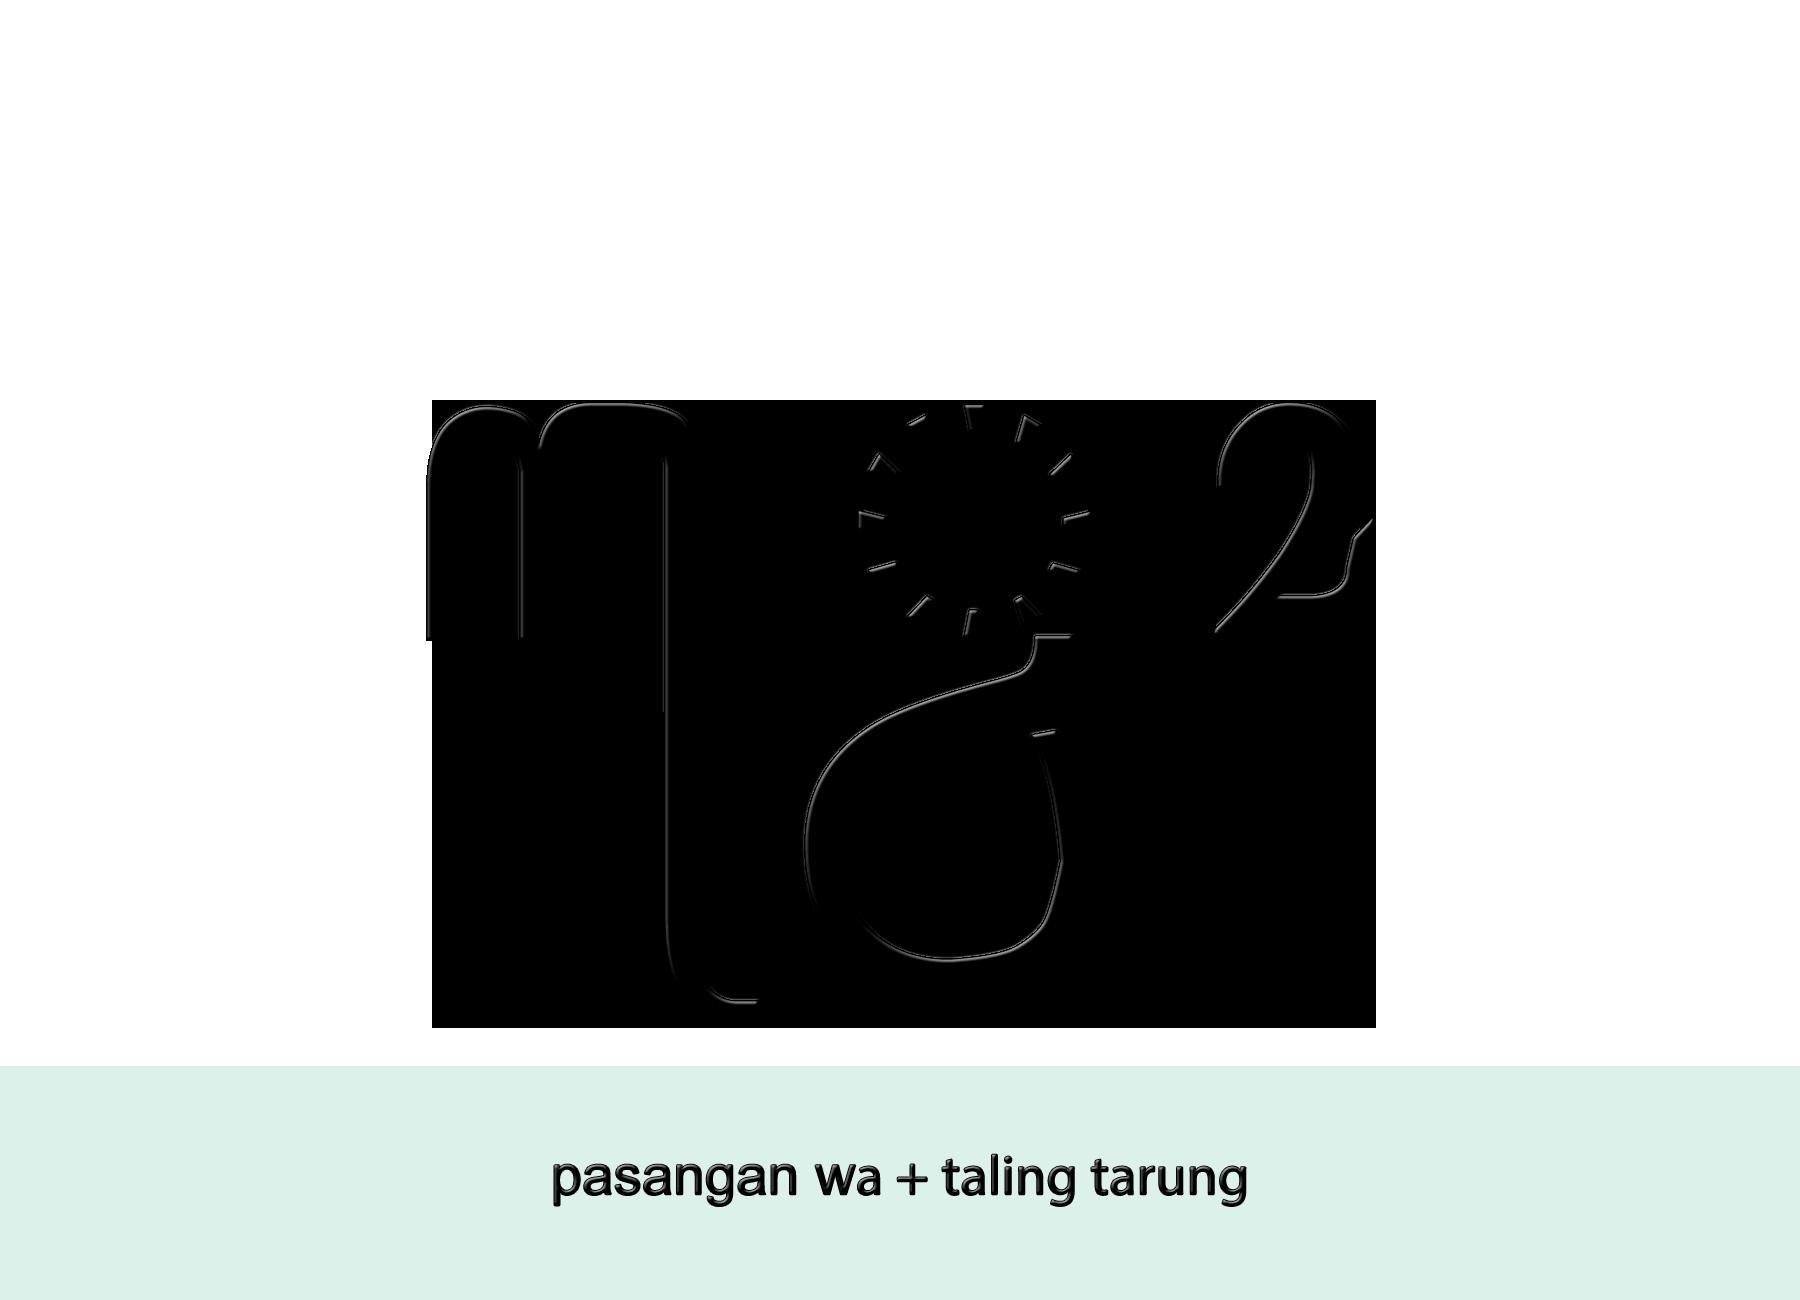 File Aksara Jawa Pasangan Wa Taling Tarung Png Wikimedia Commons